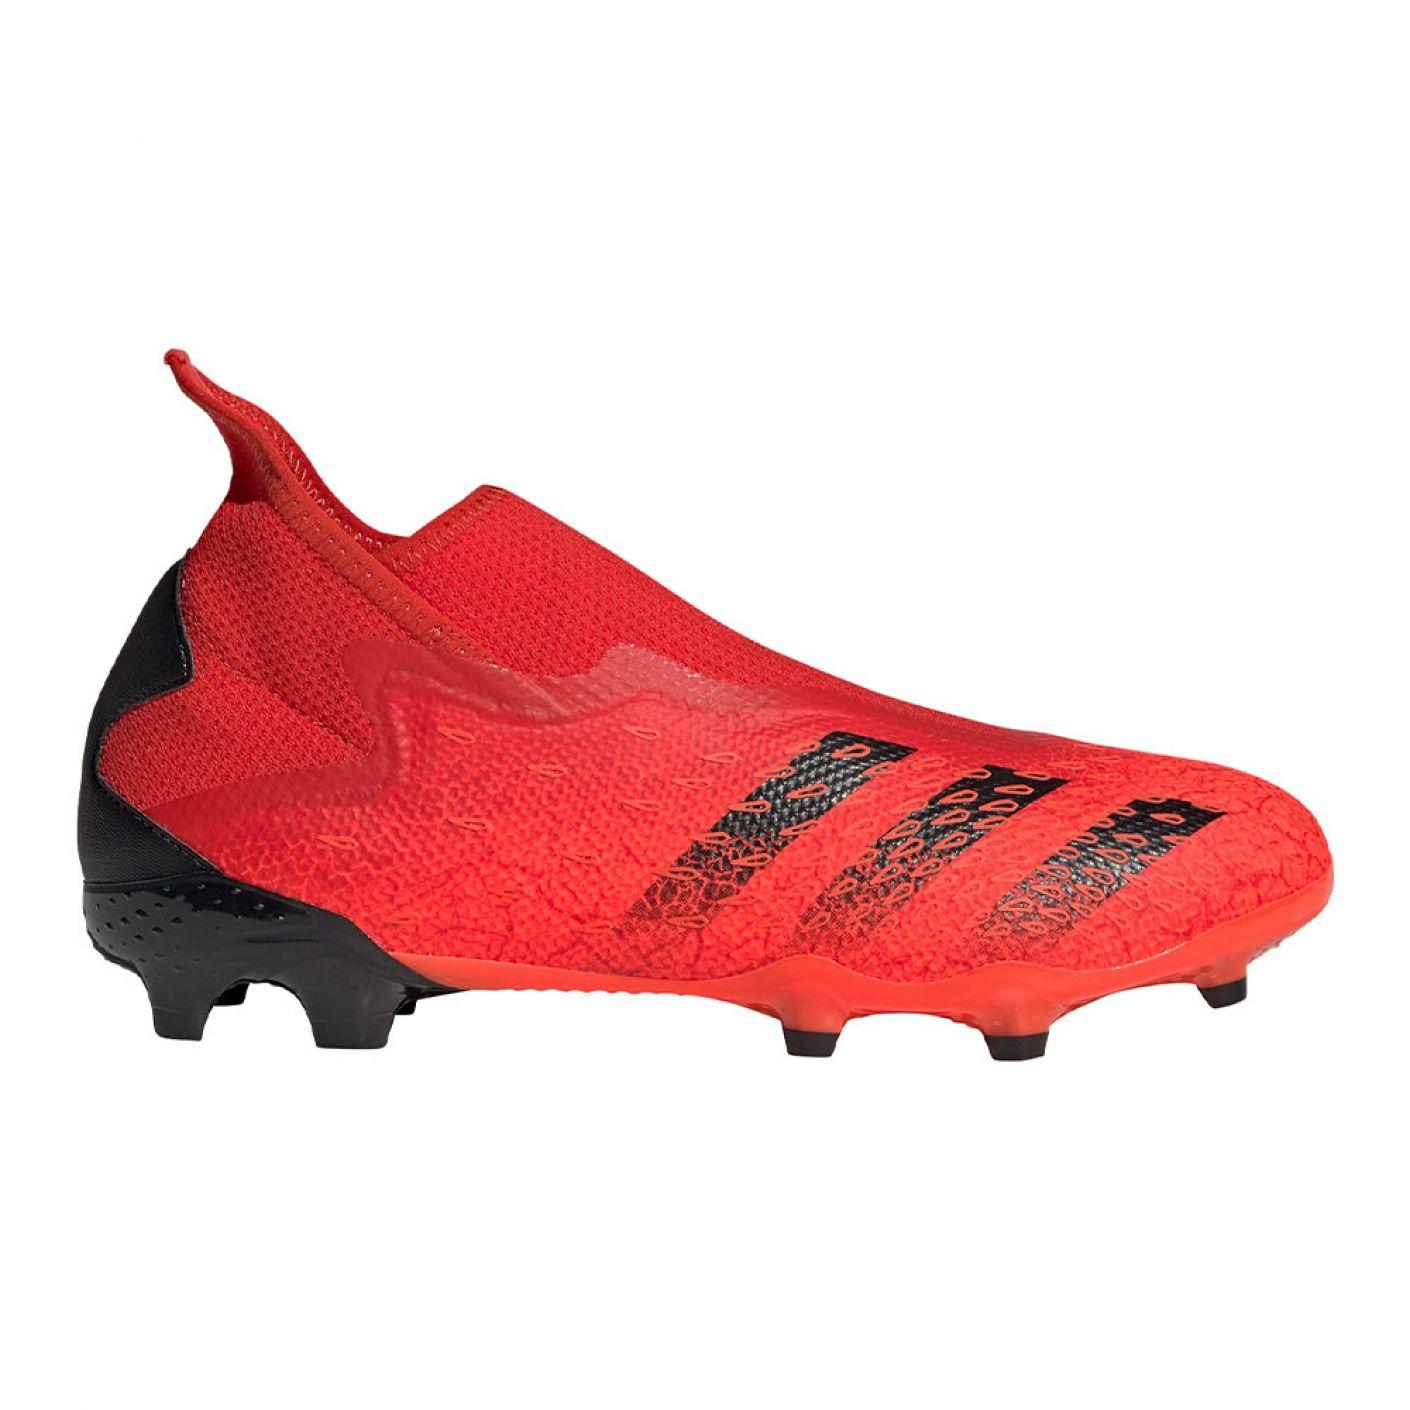 adidas Predator Freak.3 LL Gras Voetbalschoenen (FG) Rood Zwart Rood